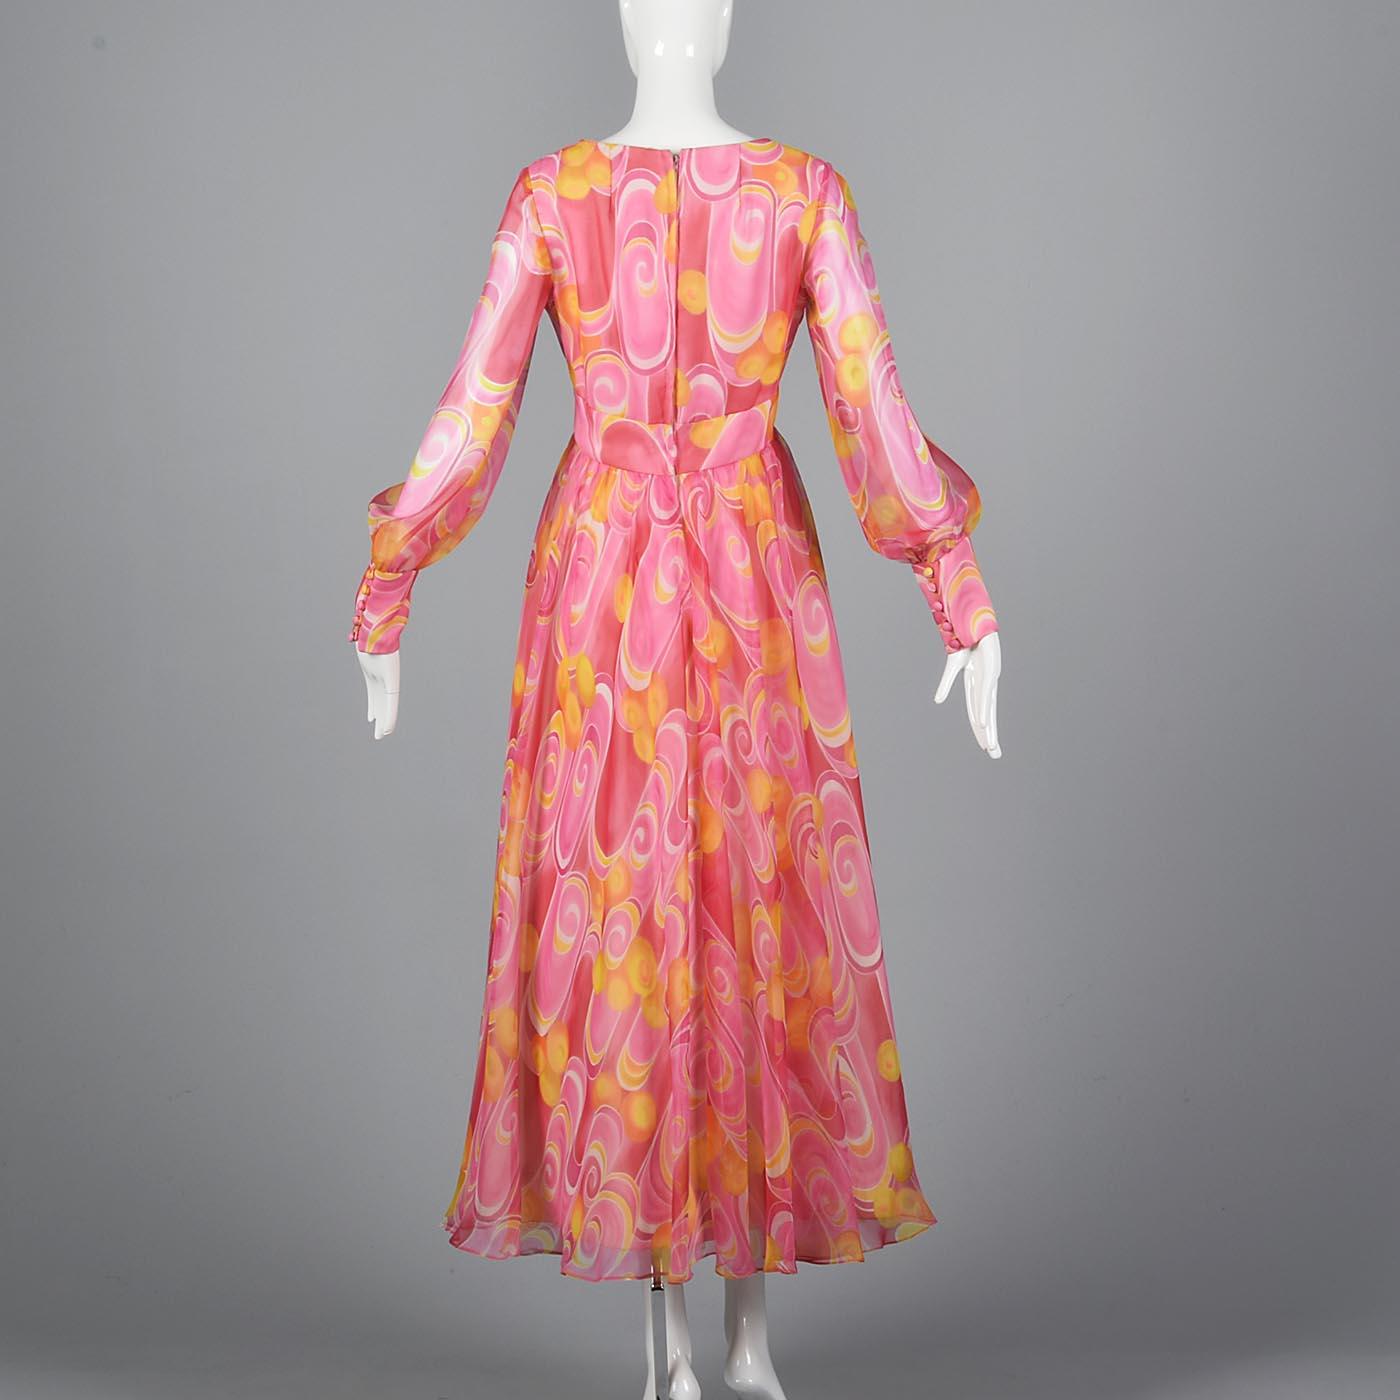 M Vintage 1970s 70s Pink Chiffon Prom Dress Long Sleeve Flowy Formal ...